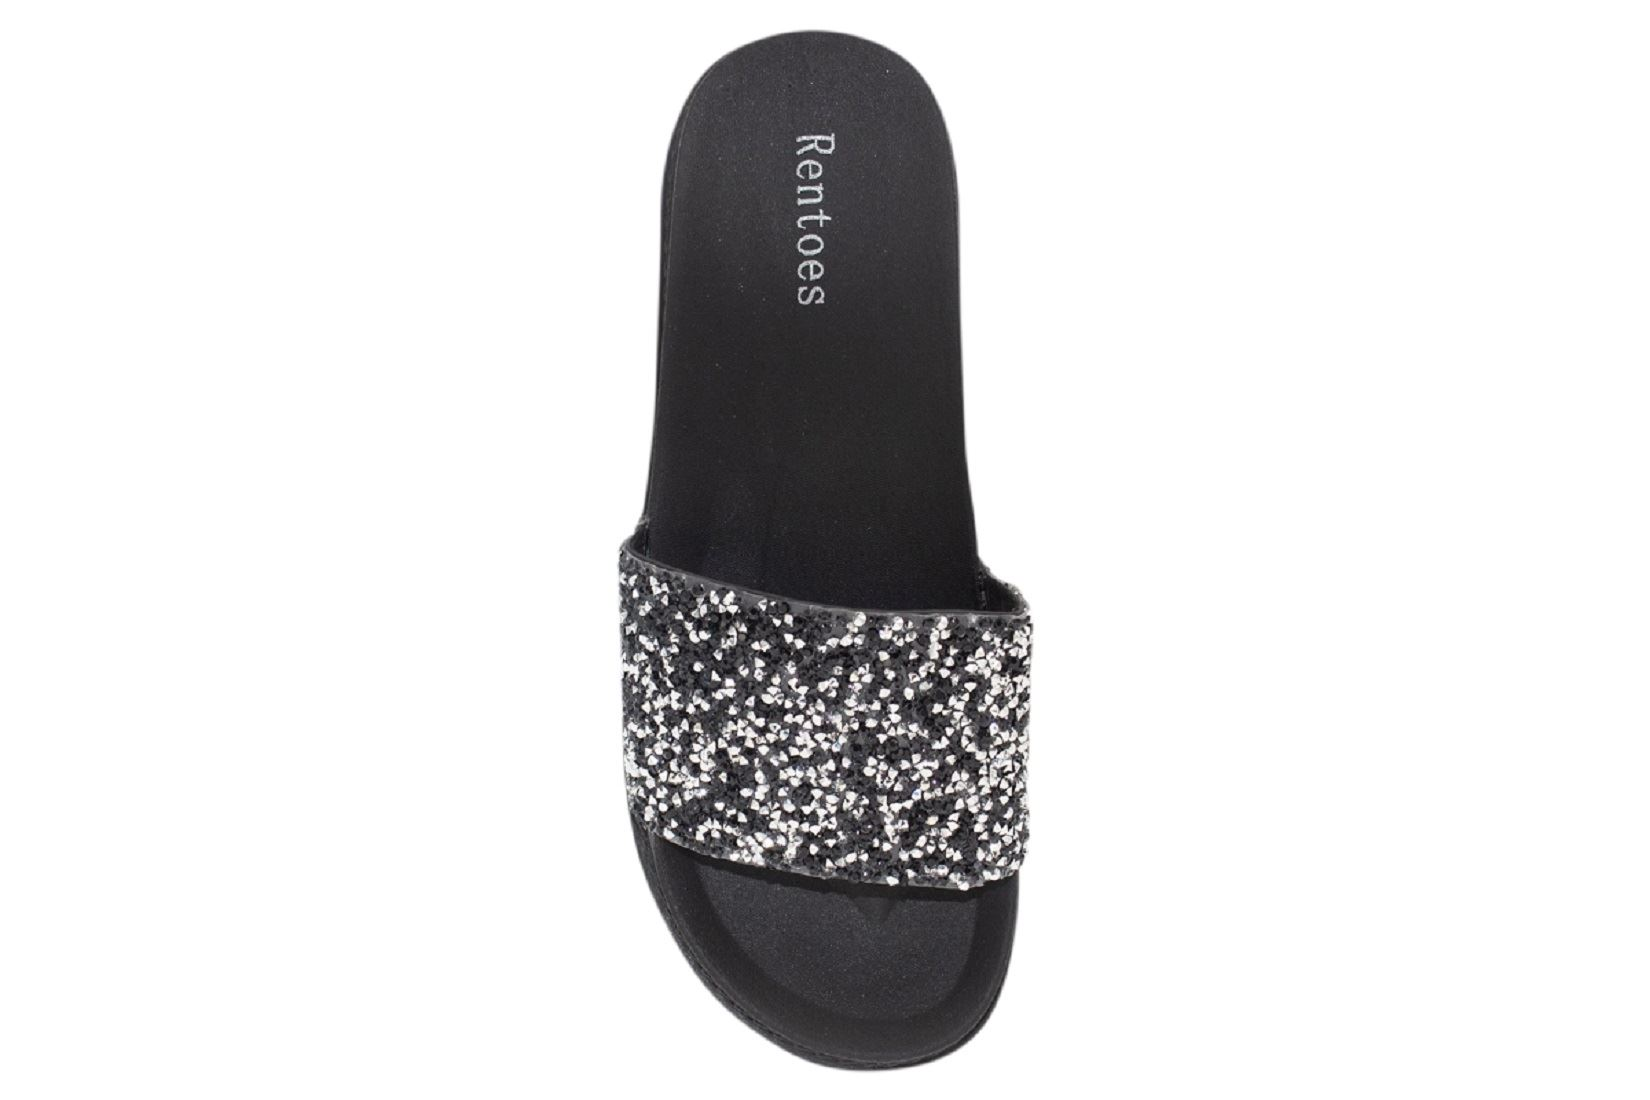 Womens-Sliders-Casual-Slippers-Mules-Ladies-Diamante-Flip-Flop-Sandals-Shoes thumbnail 29